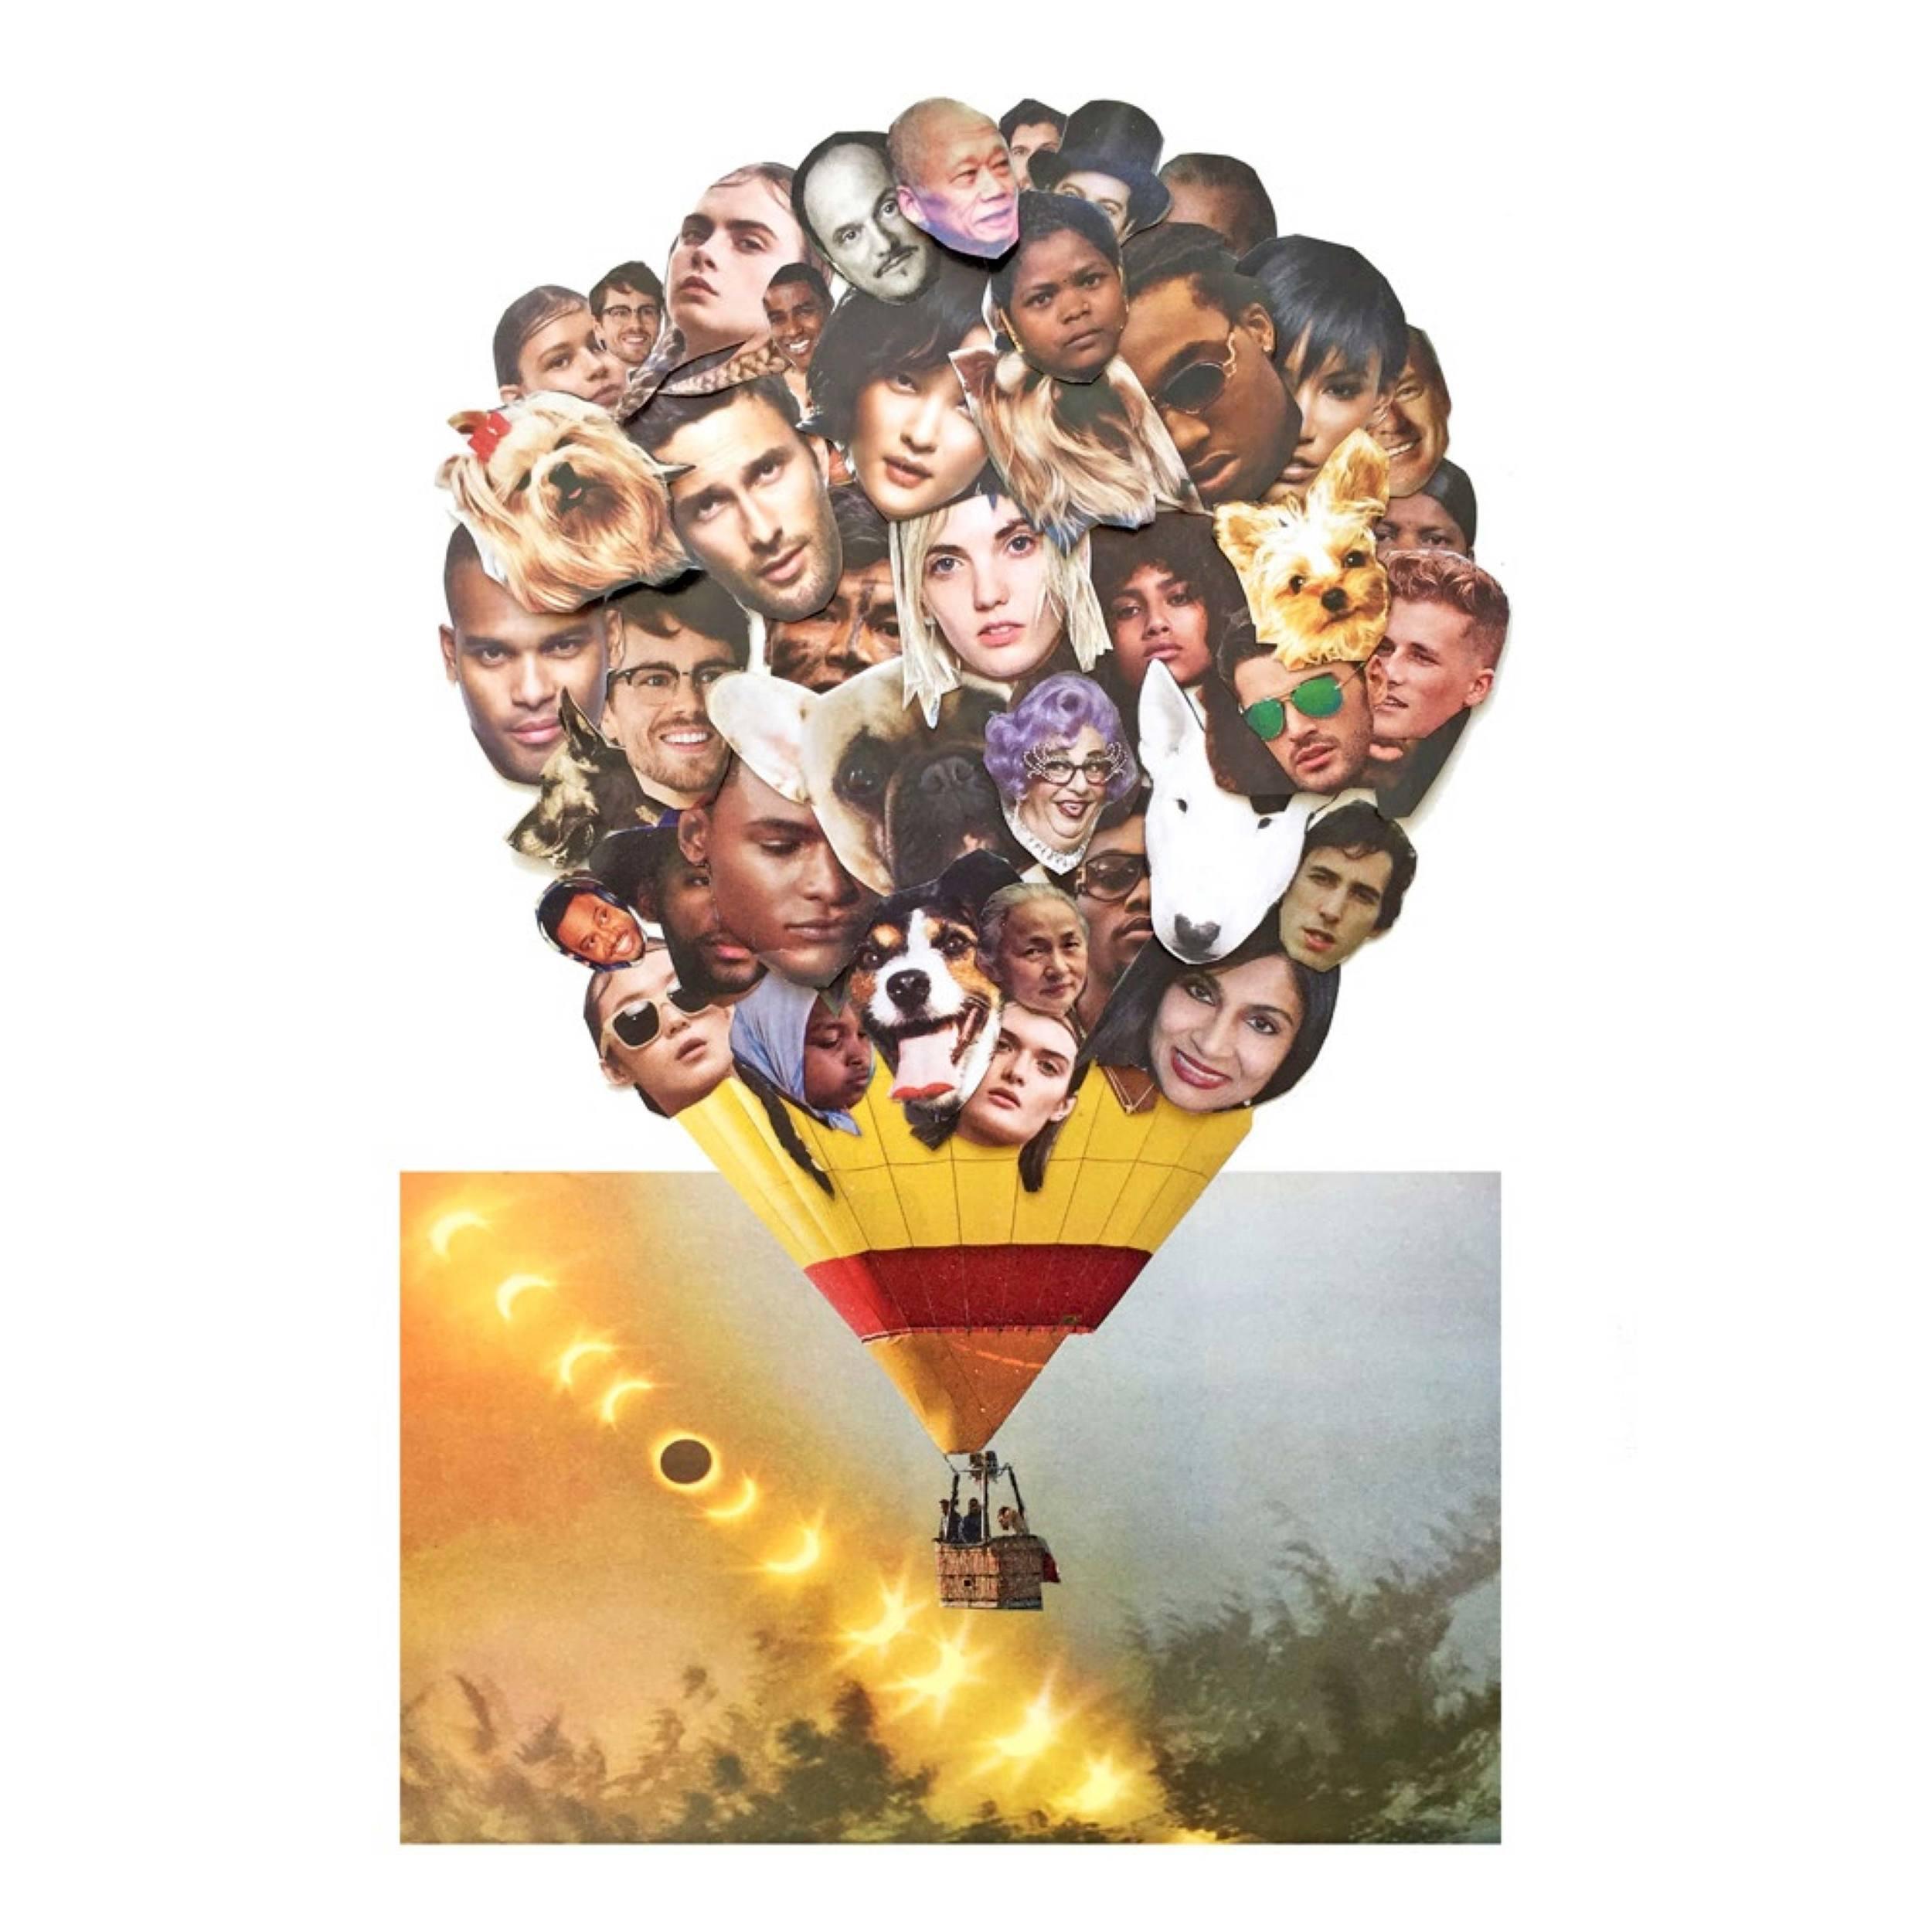 zbook_balloon_sq_w.jpg